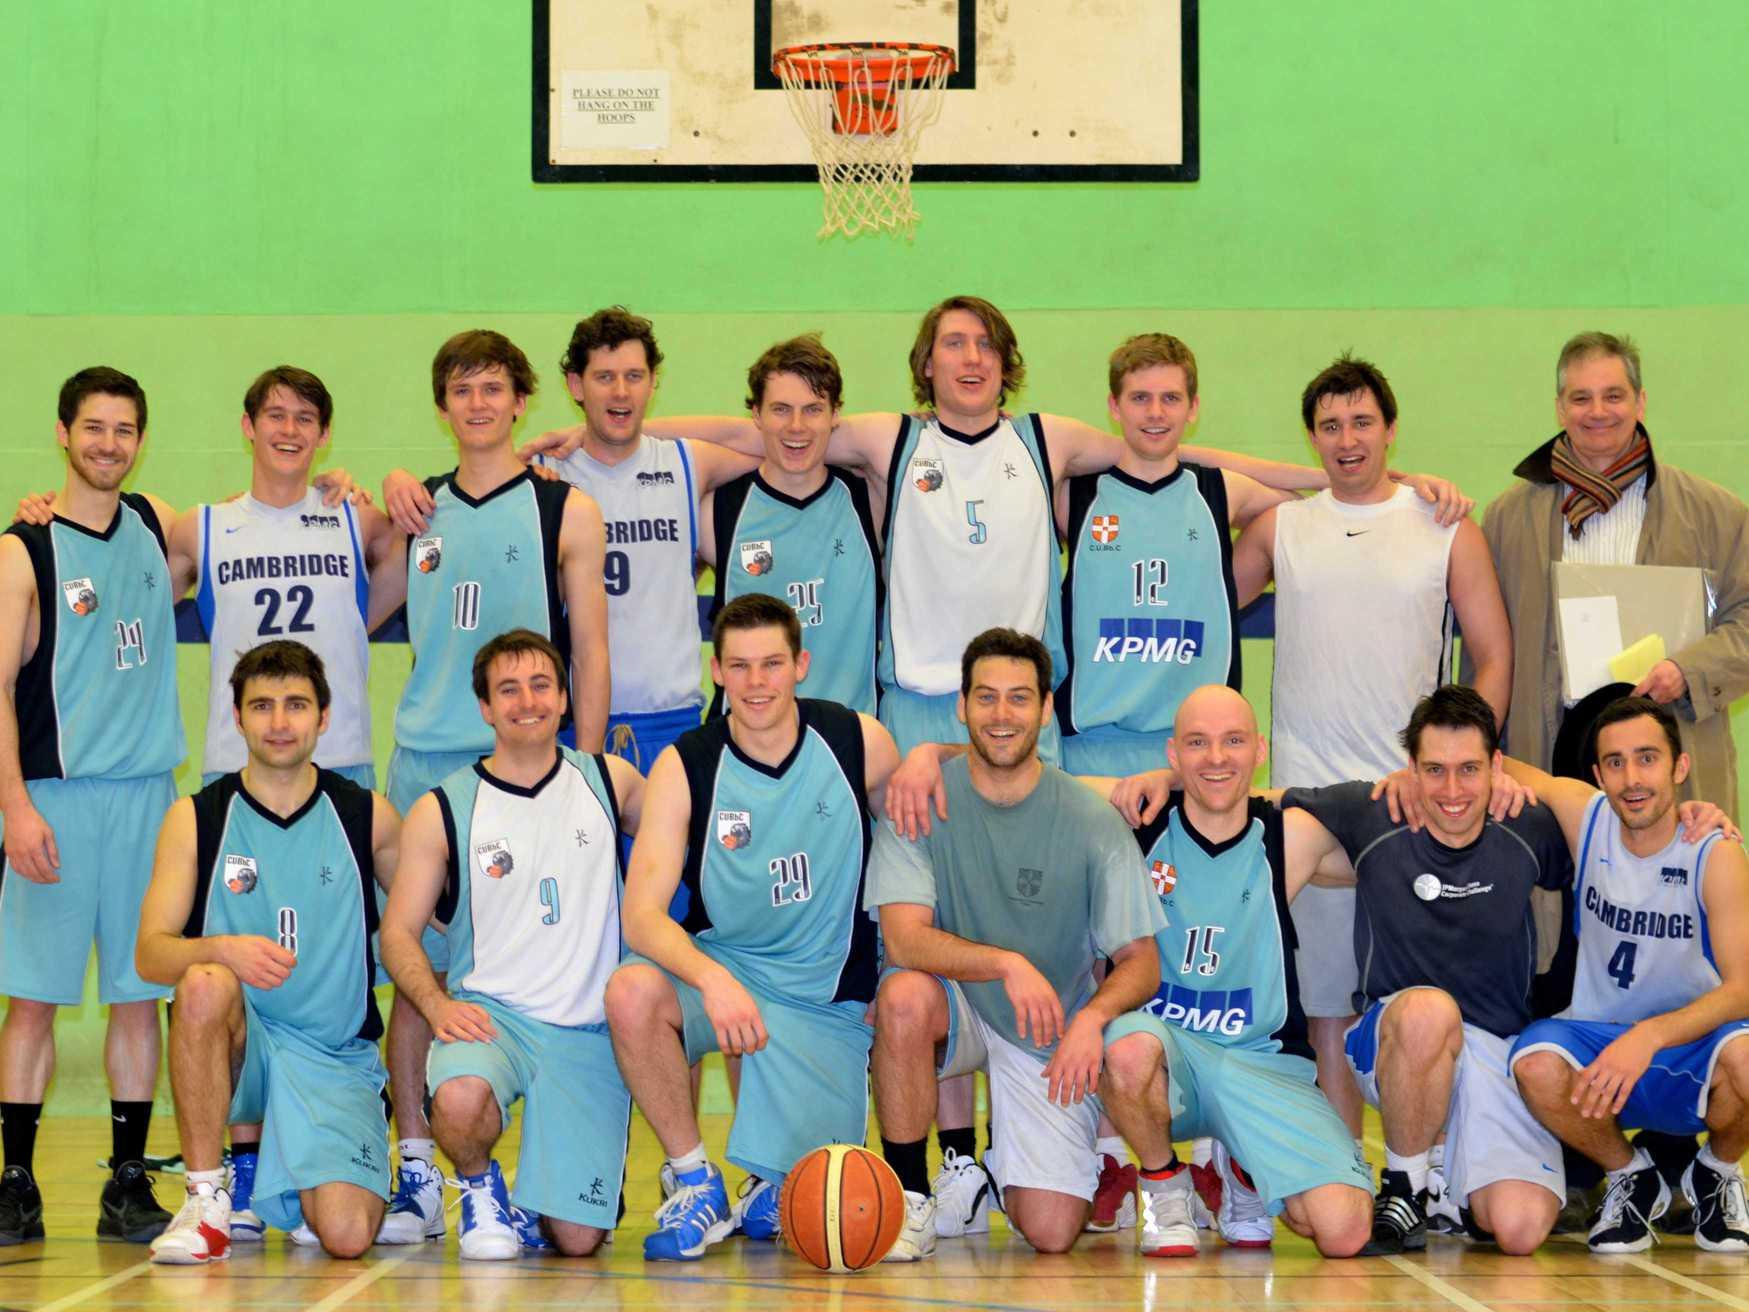 Alumni Match 2012